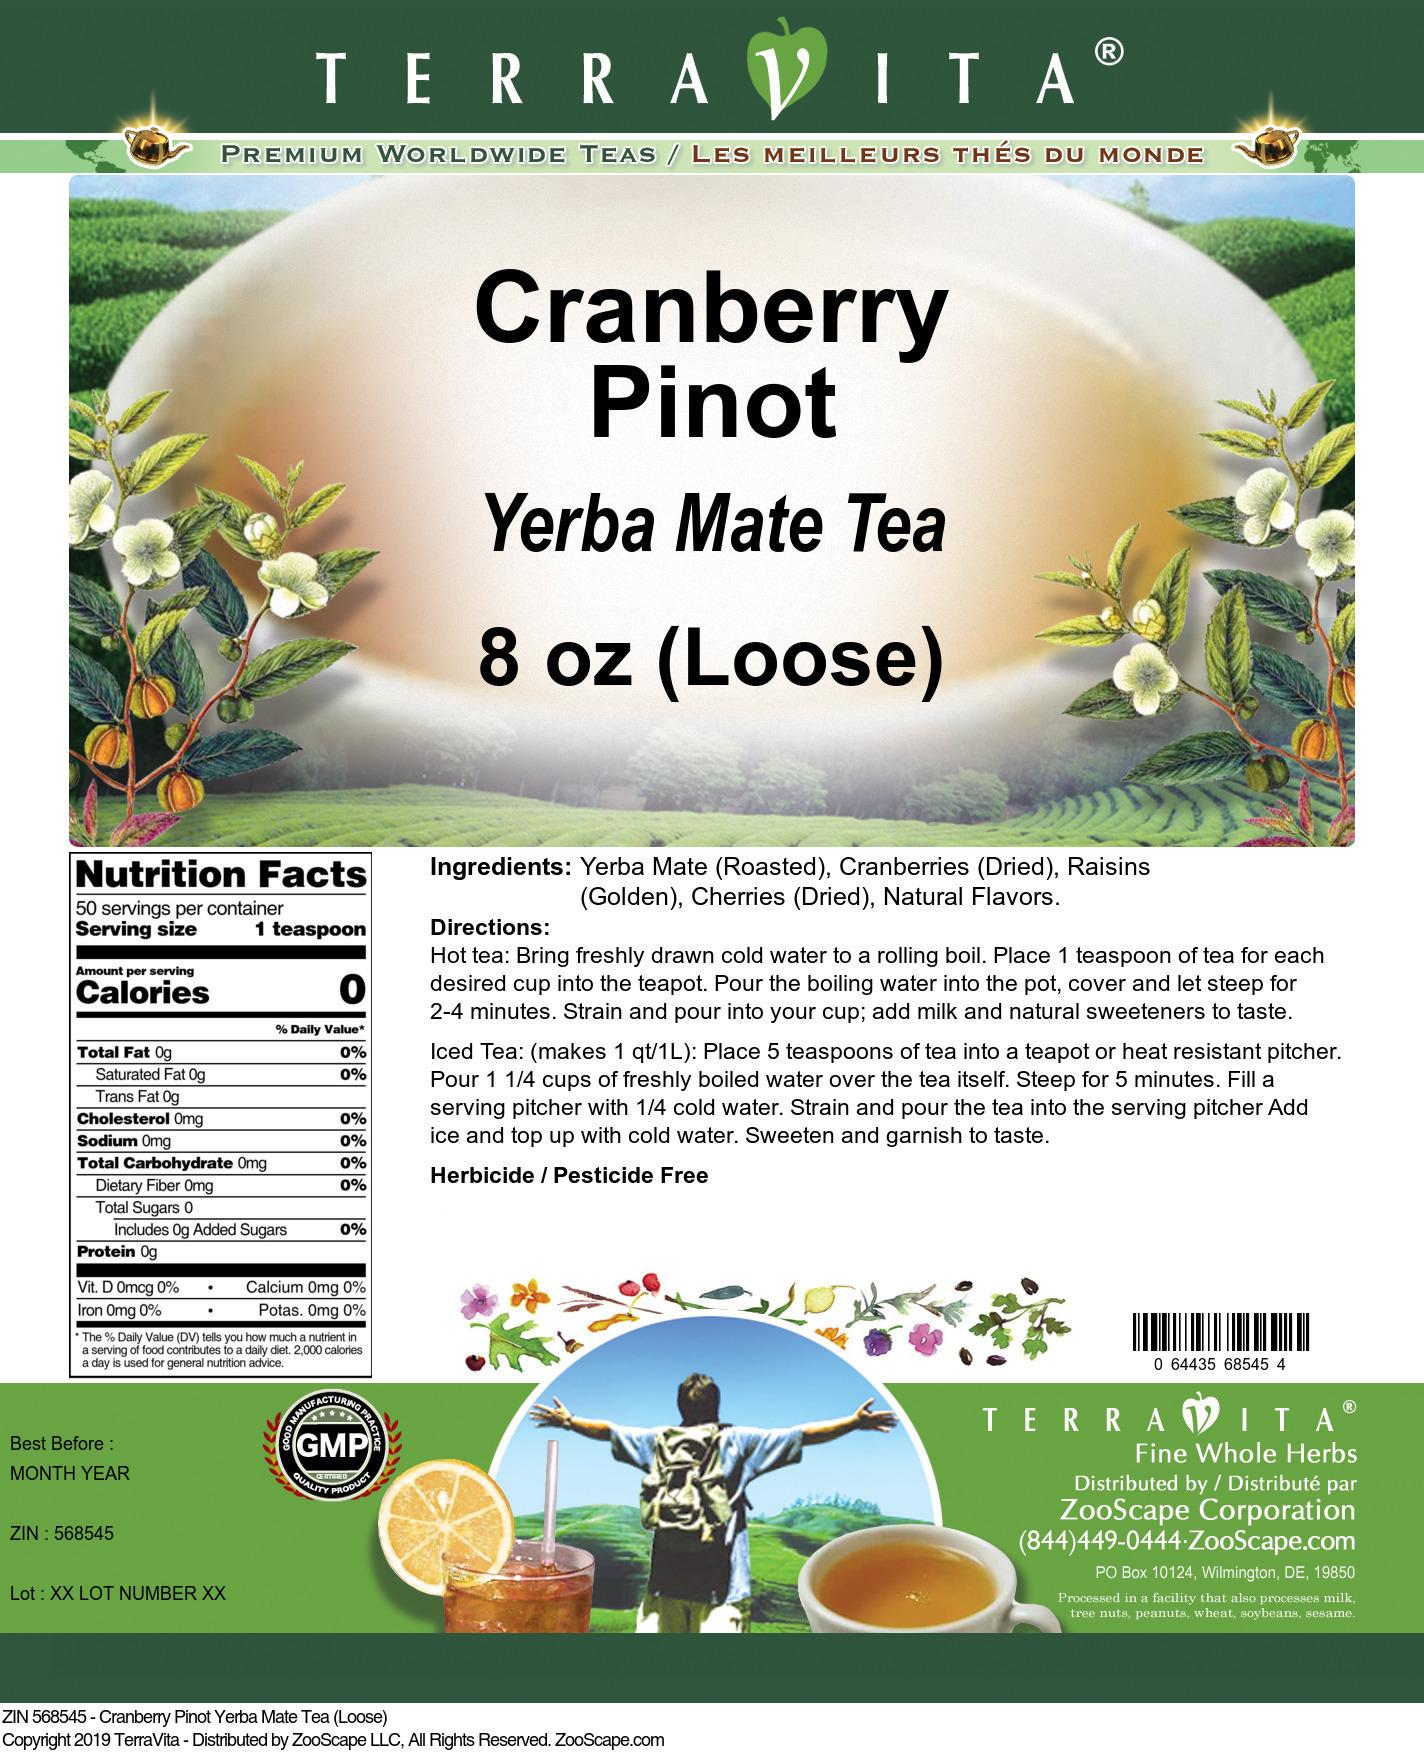 Cranberry Pinot Yerba Mate Tea (Loose)